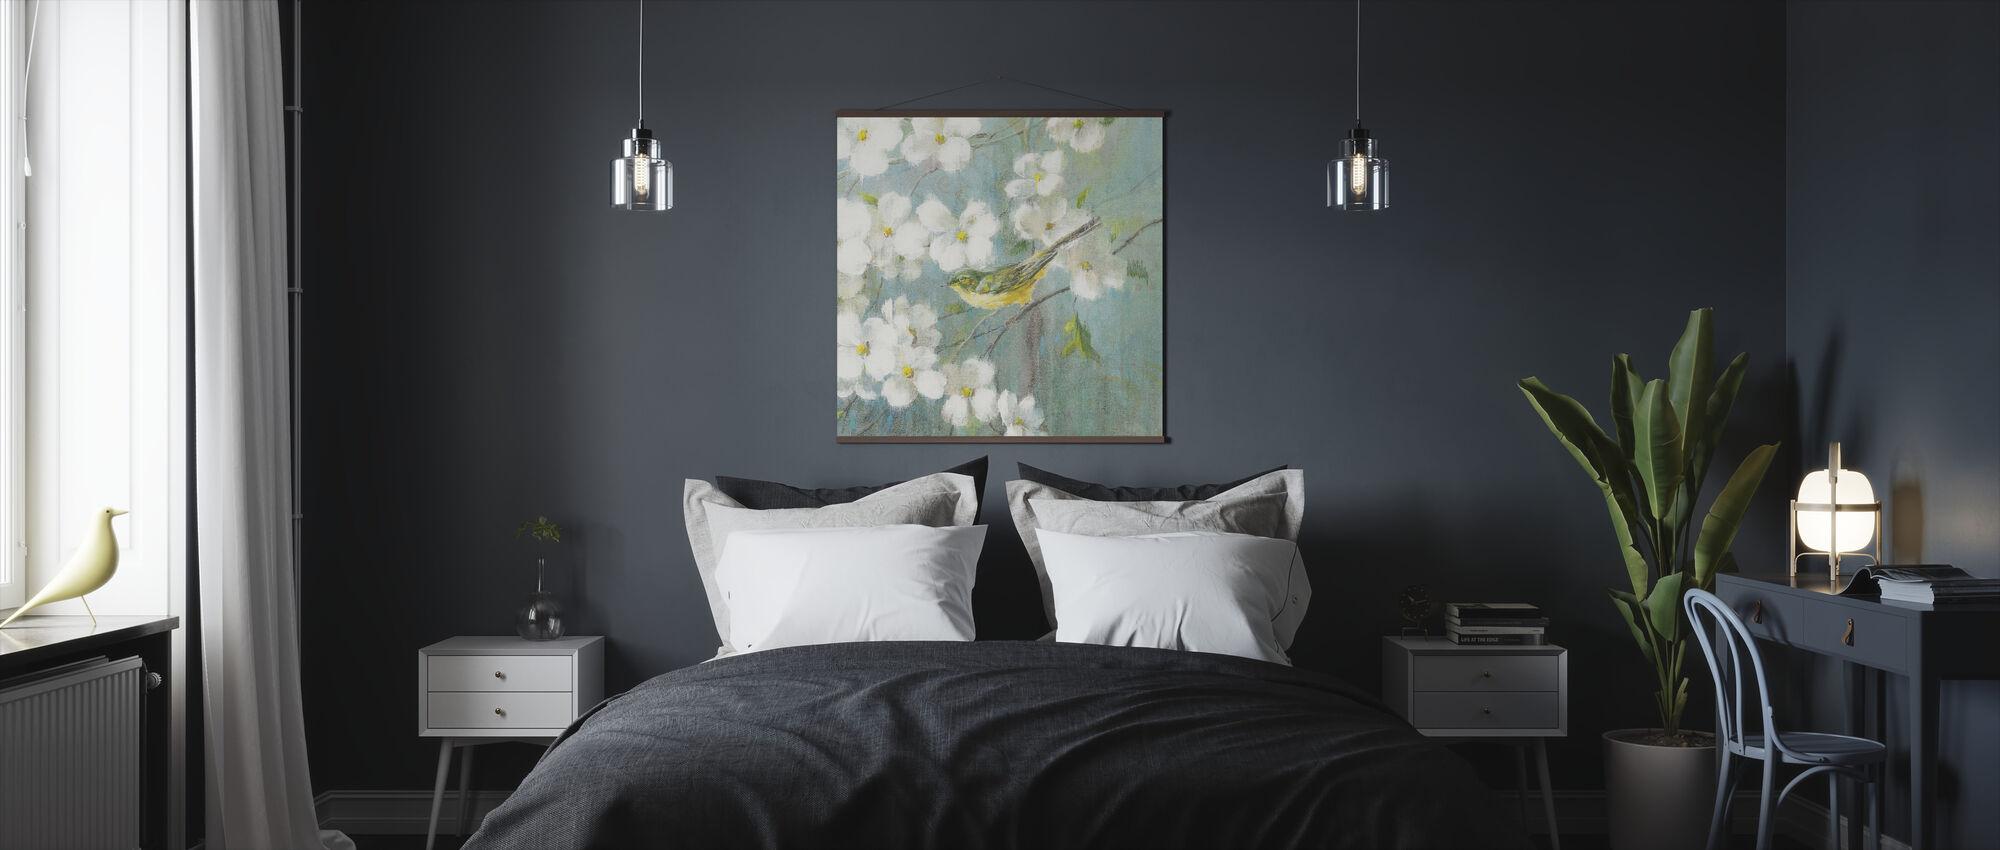 Spring Dream 4 - Poster - Bedroom